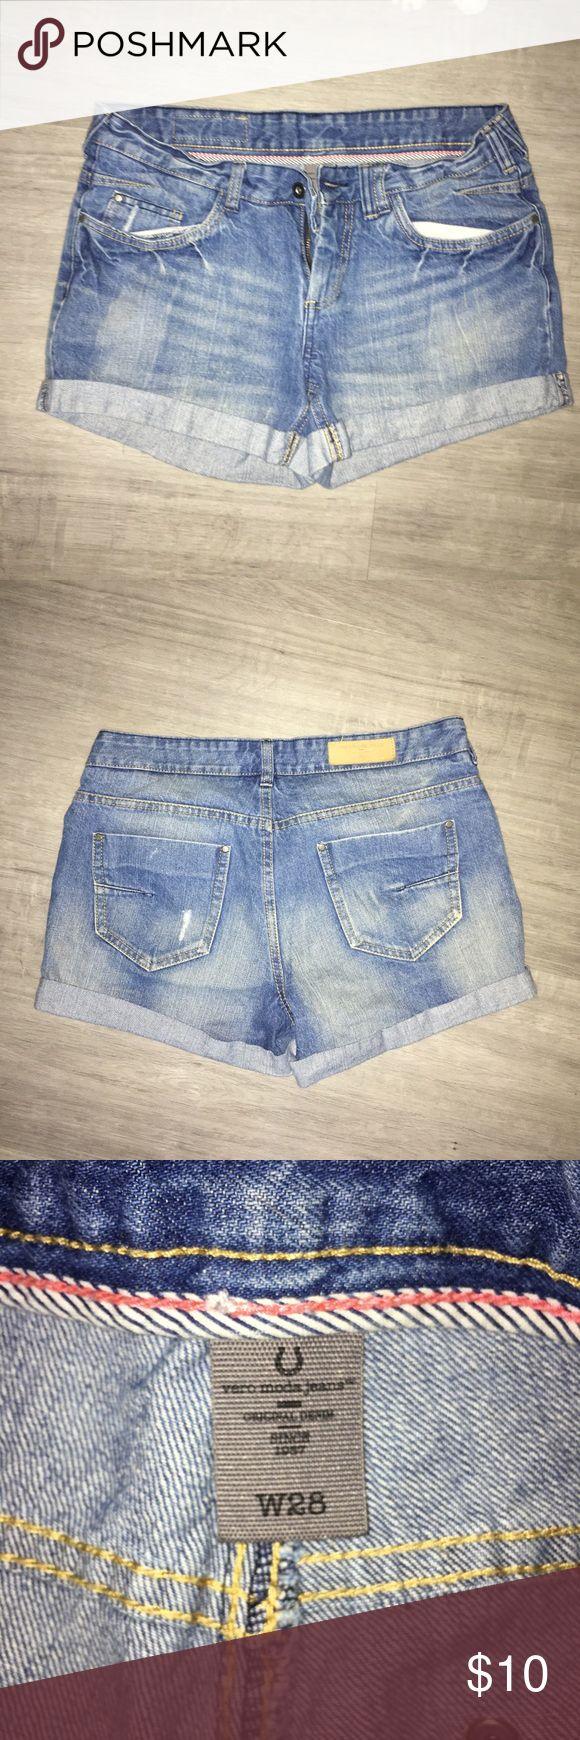 Vero Moda Jean Shorts Vero Moda Jean Shorts Shorts Jean Shorts